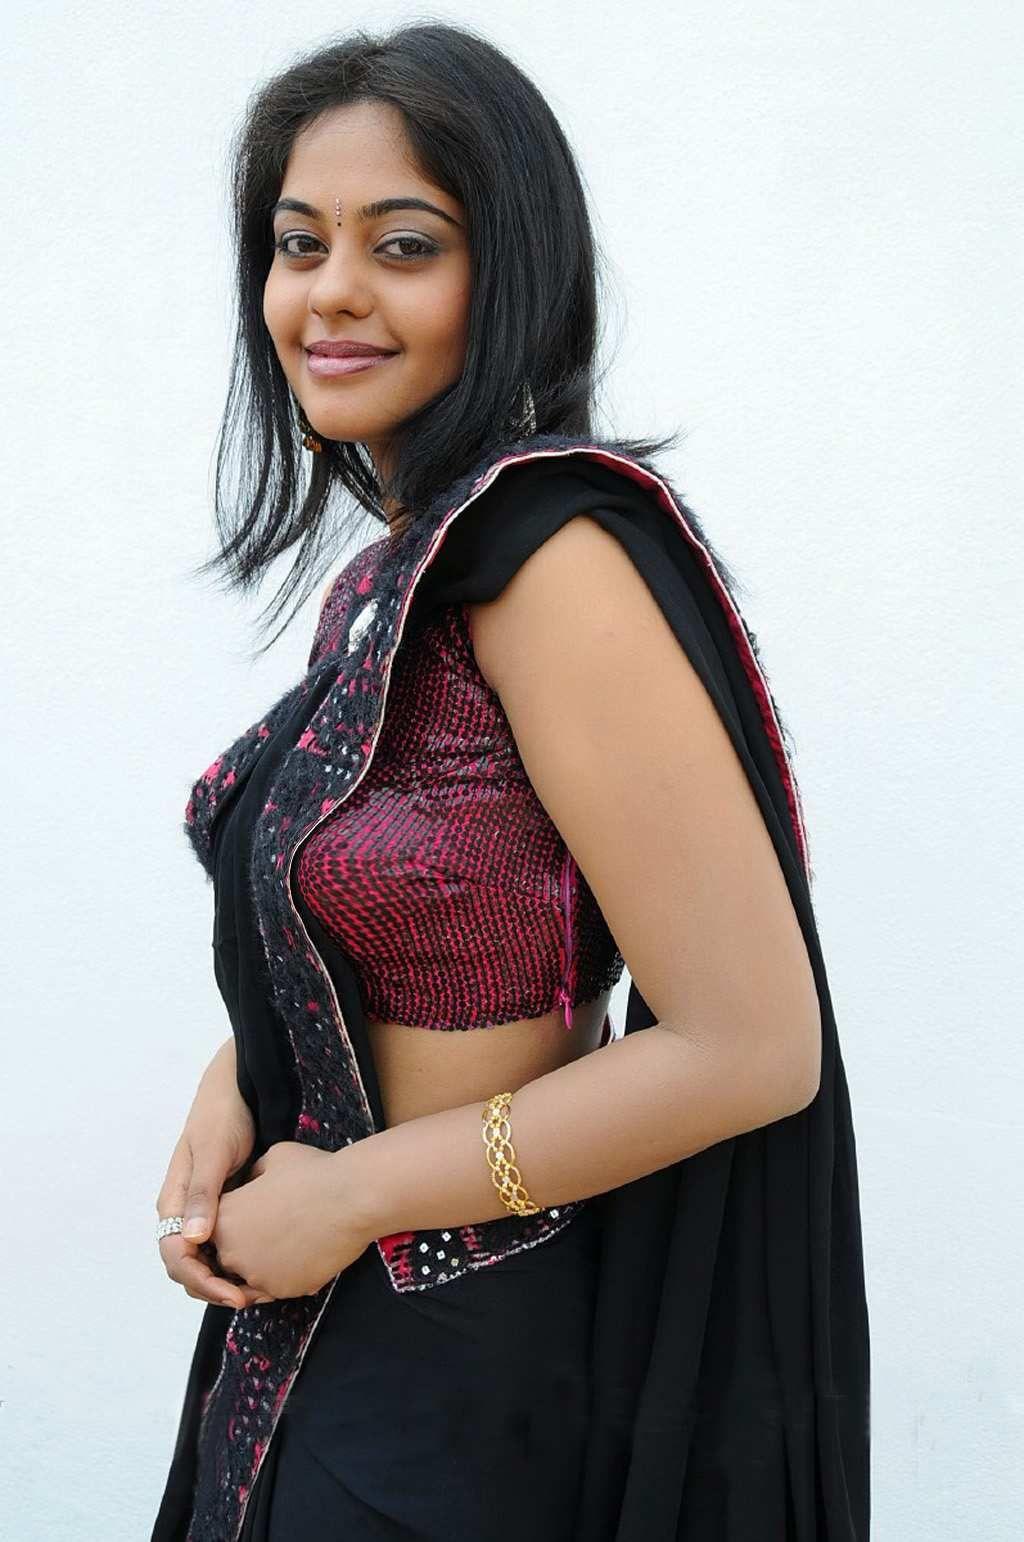 Bindu Madhavi Indian Actresses Vol V Pinterest Bindu Madhavi